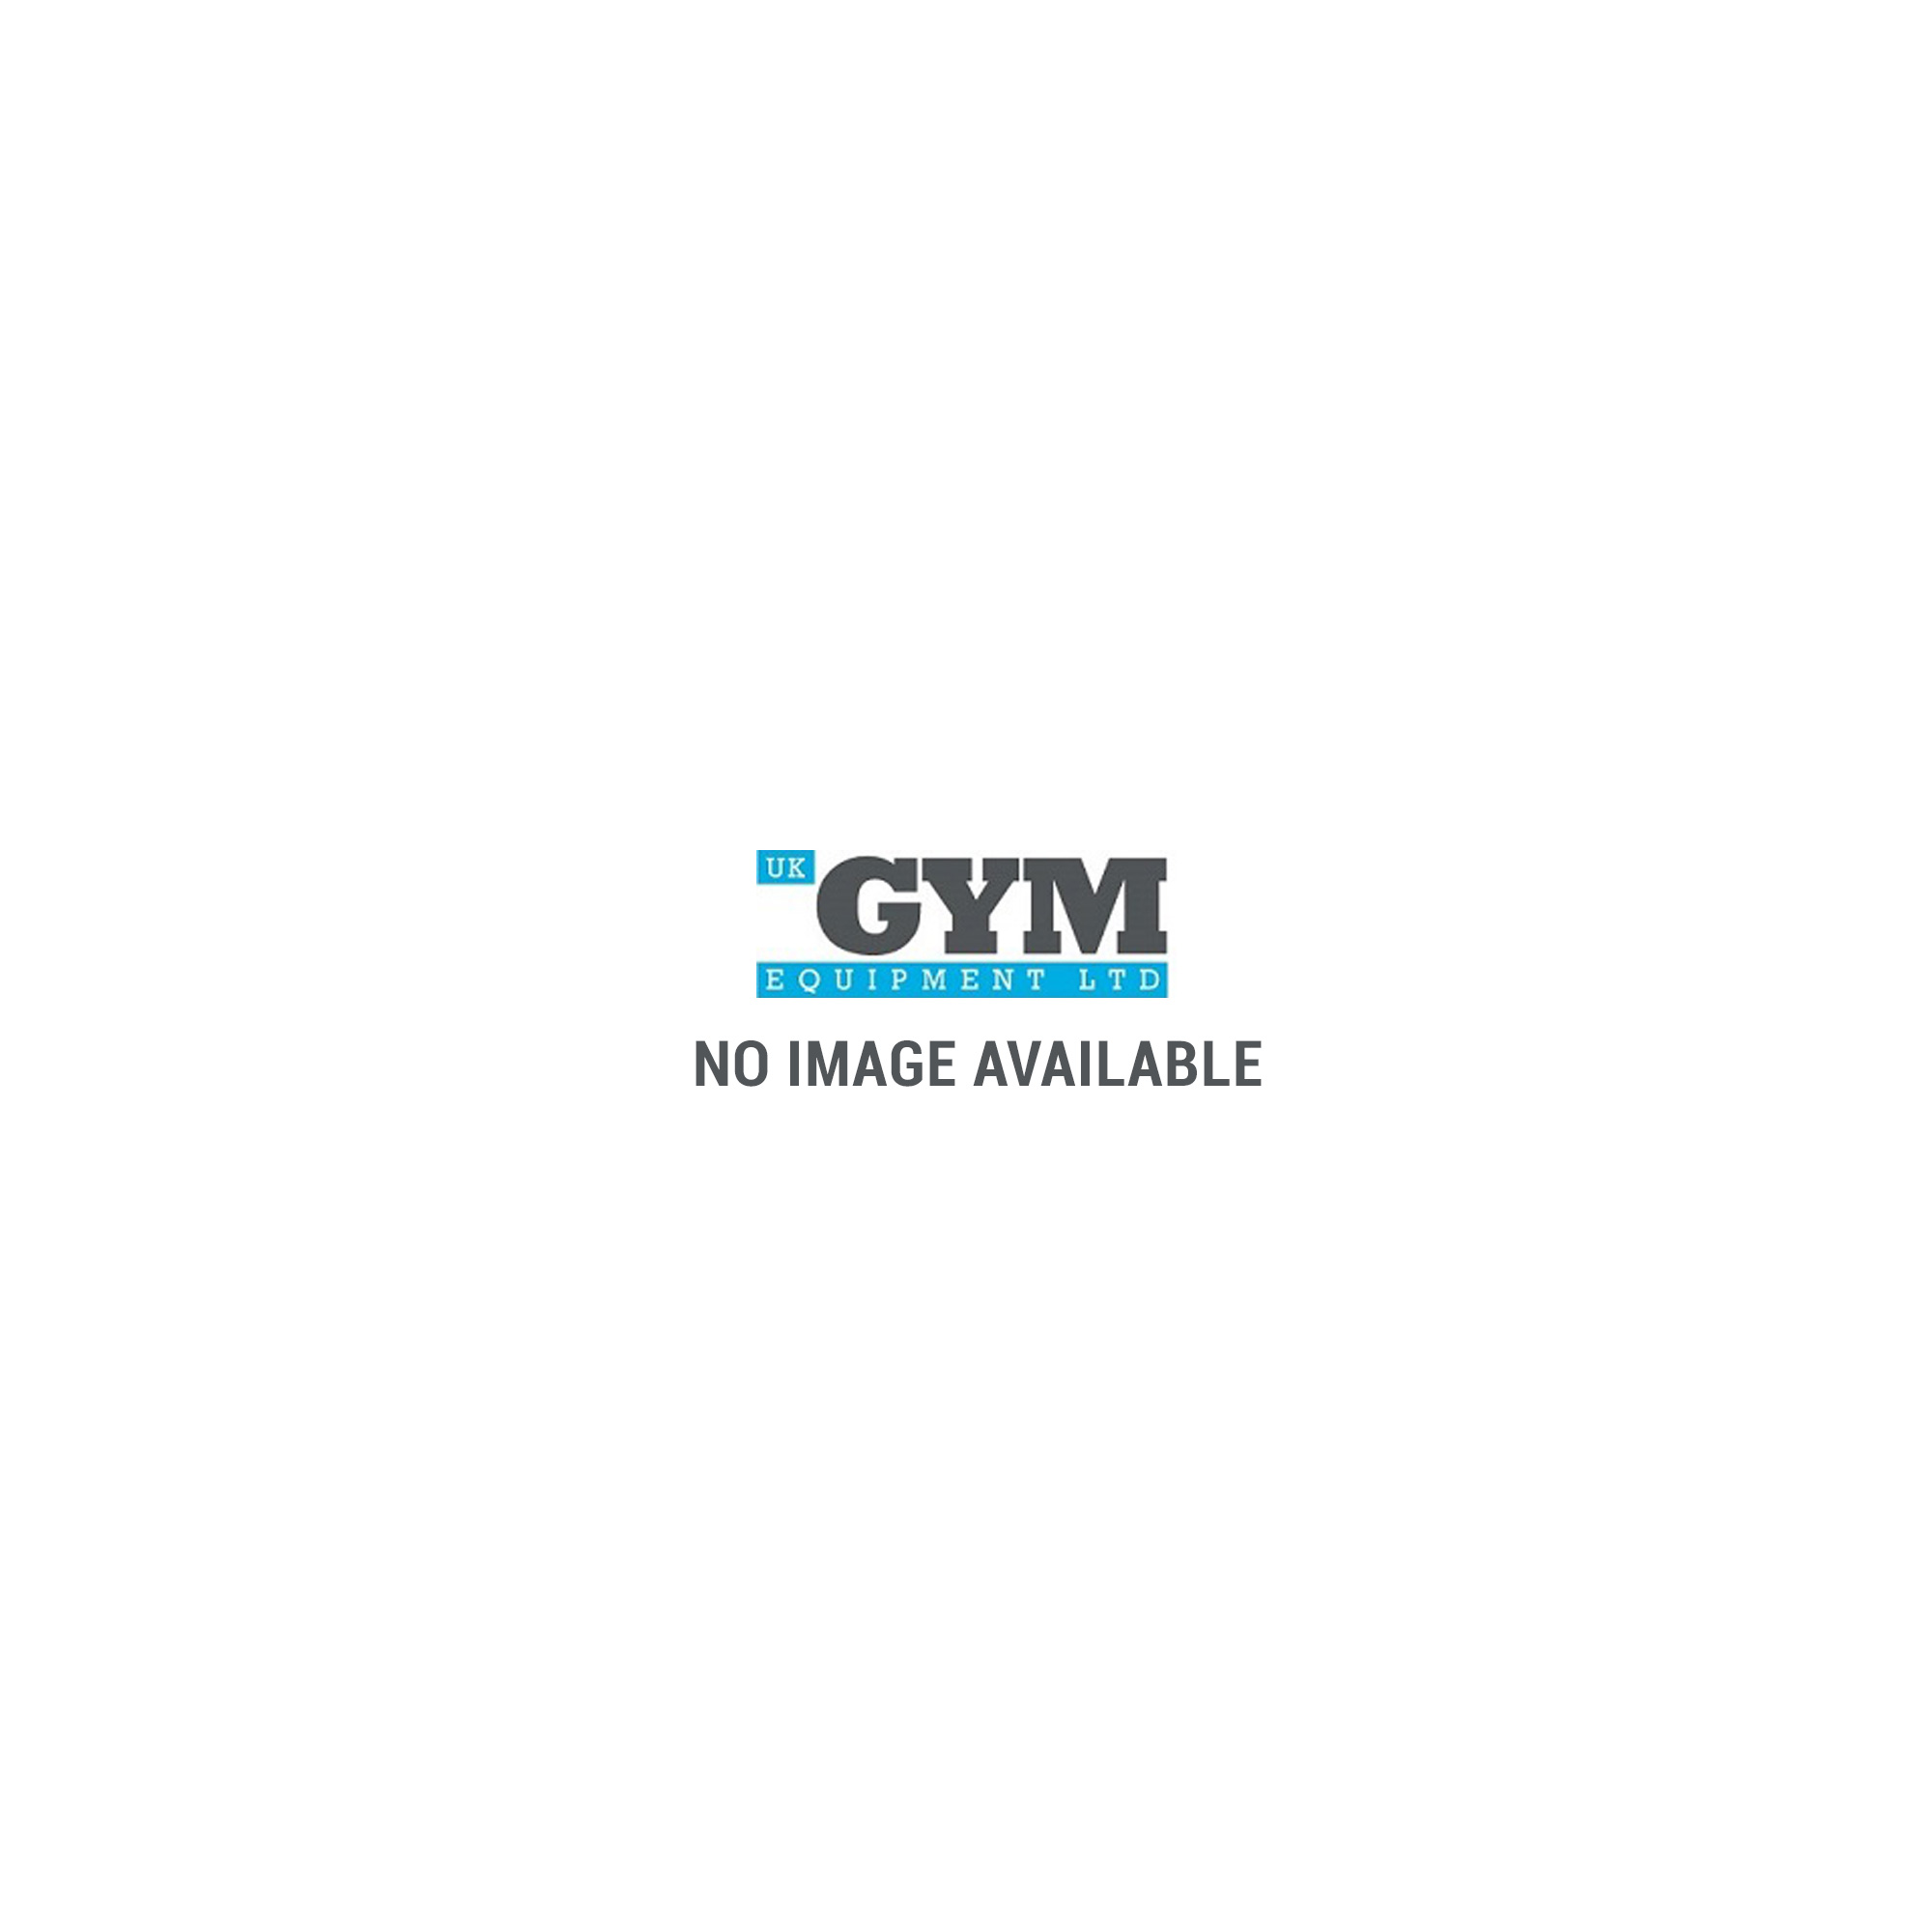 Stealth Elite Fitness Premium Rubber/Stainless Steel Barbell Set 10-45kg  (10 Barbells)